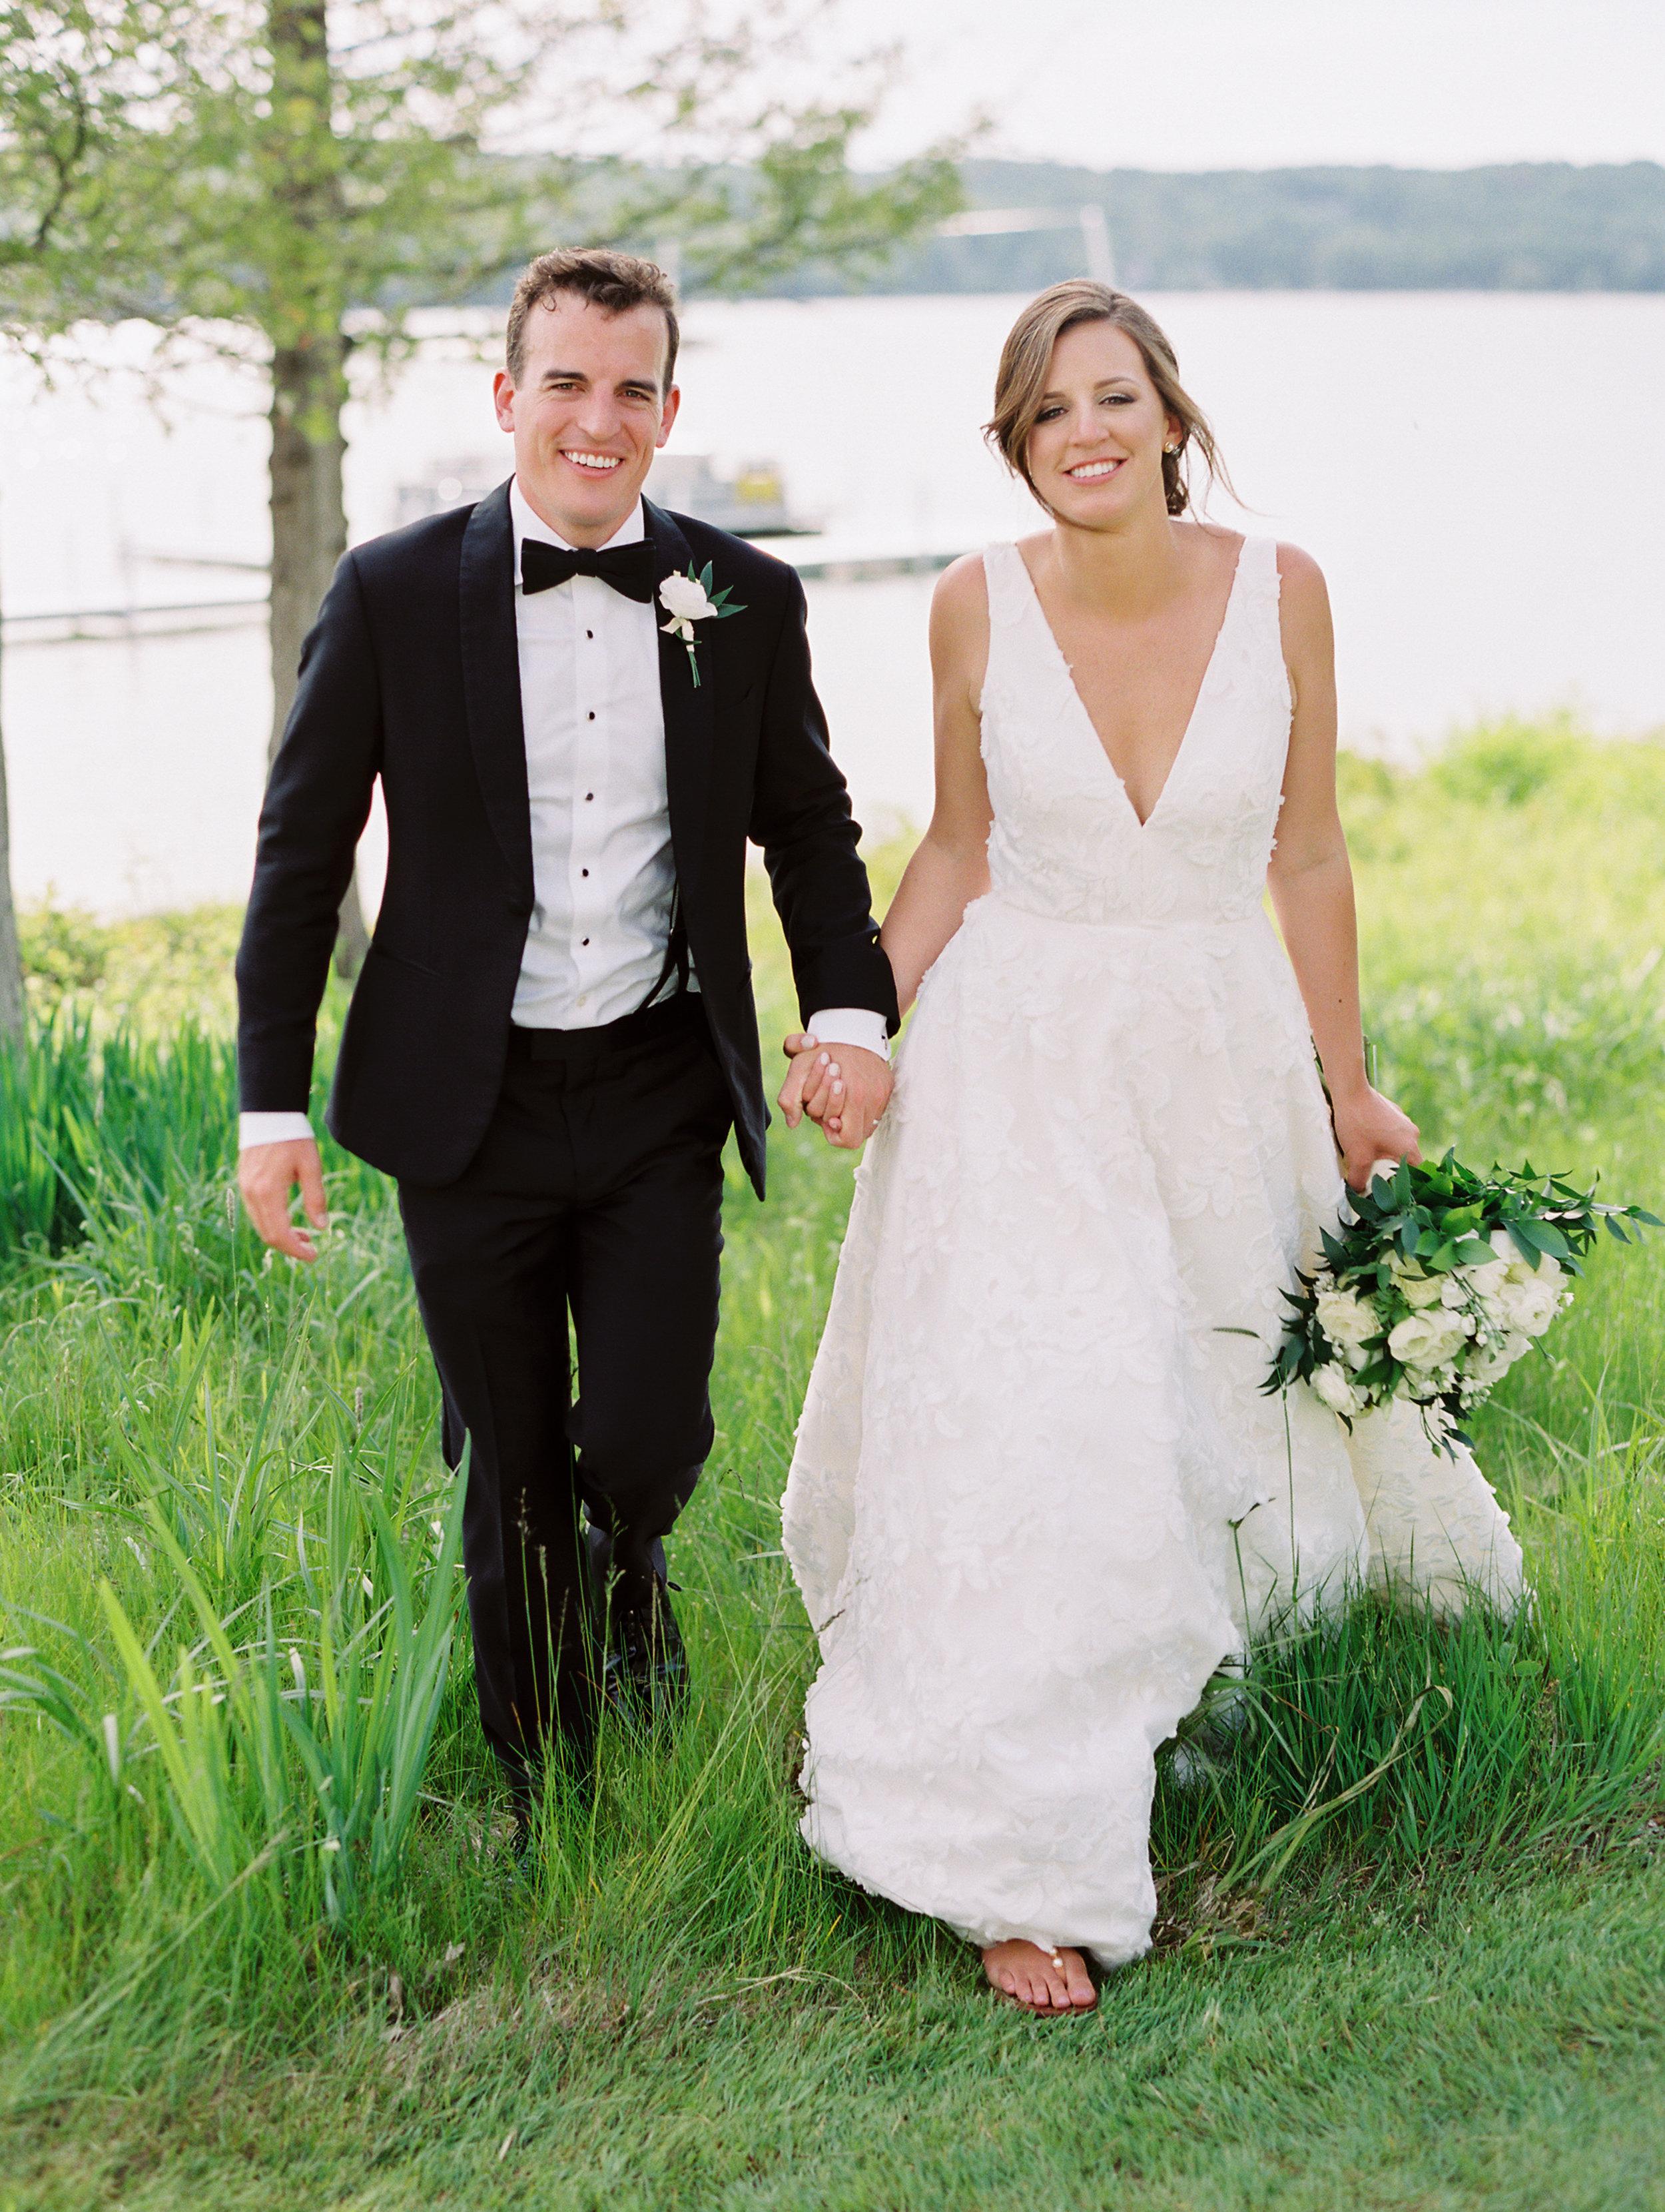 DeGuilio+Wedding+BrideGroomSunsetf-9.jpg